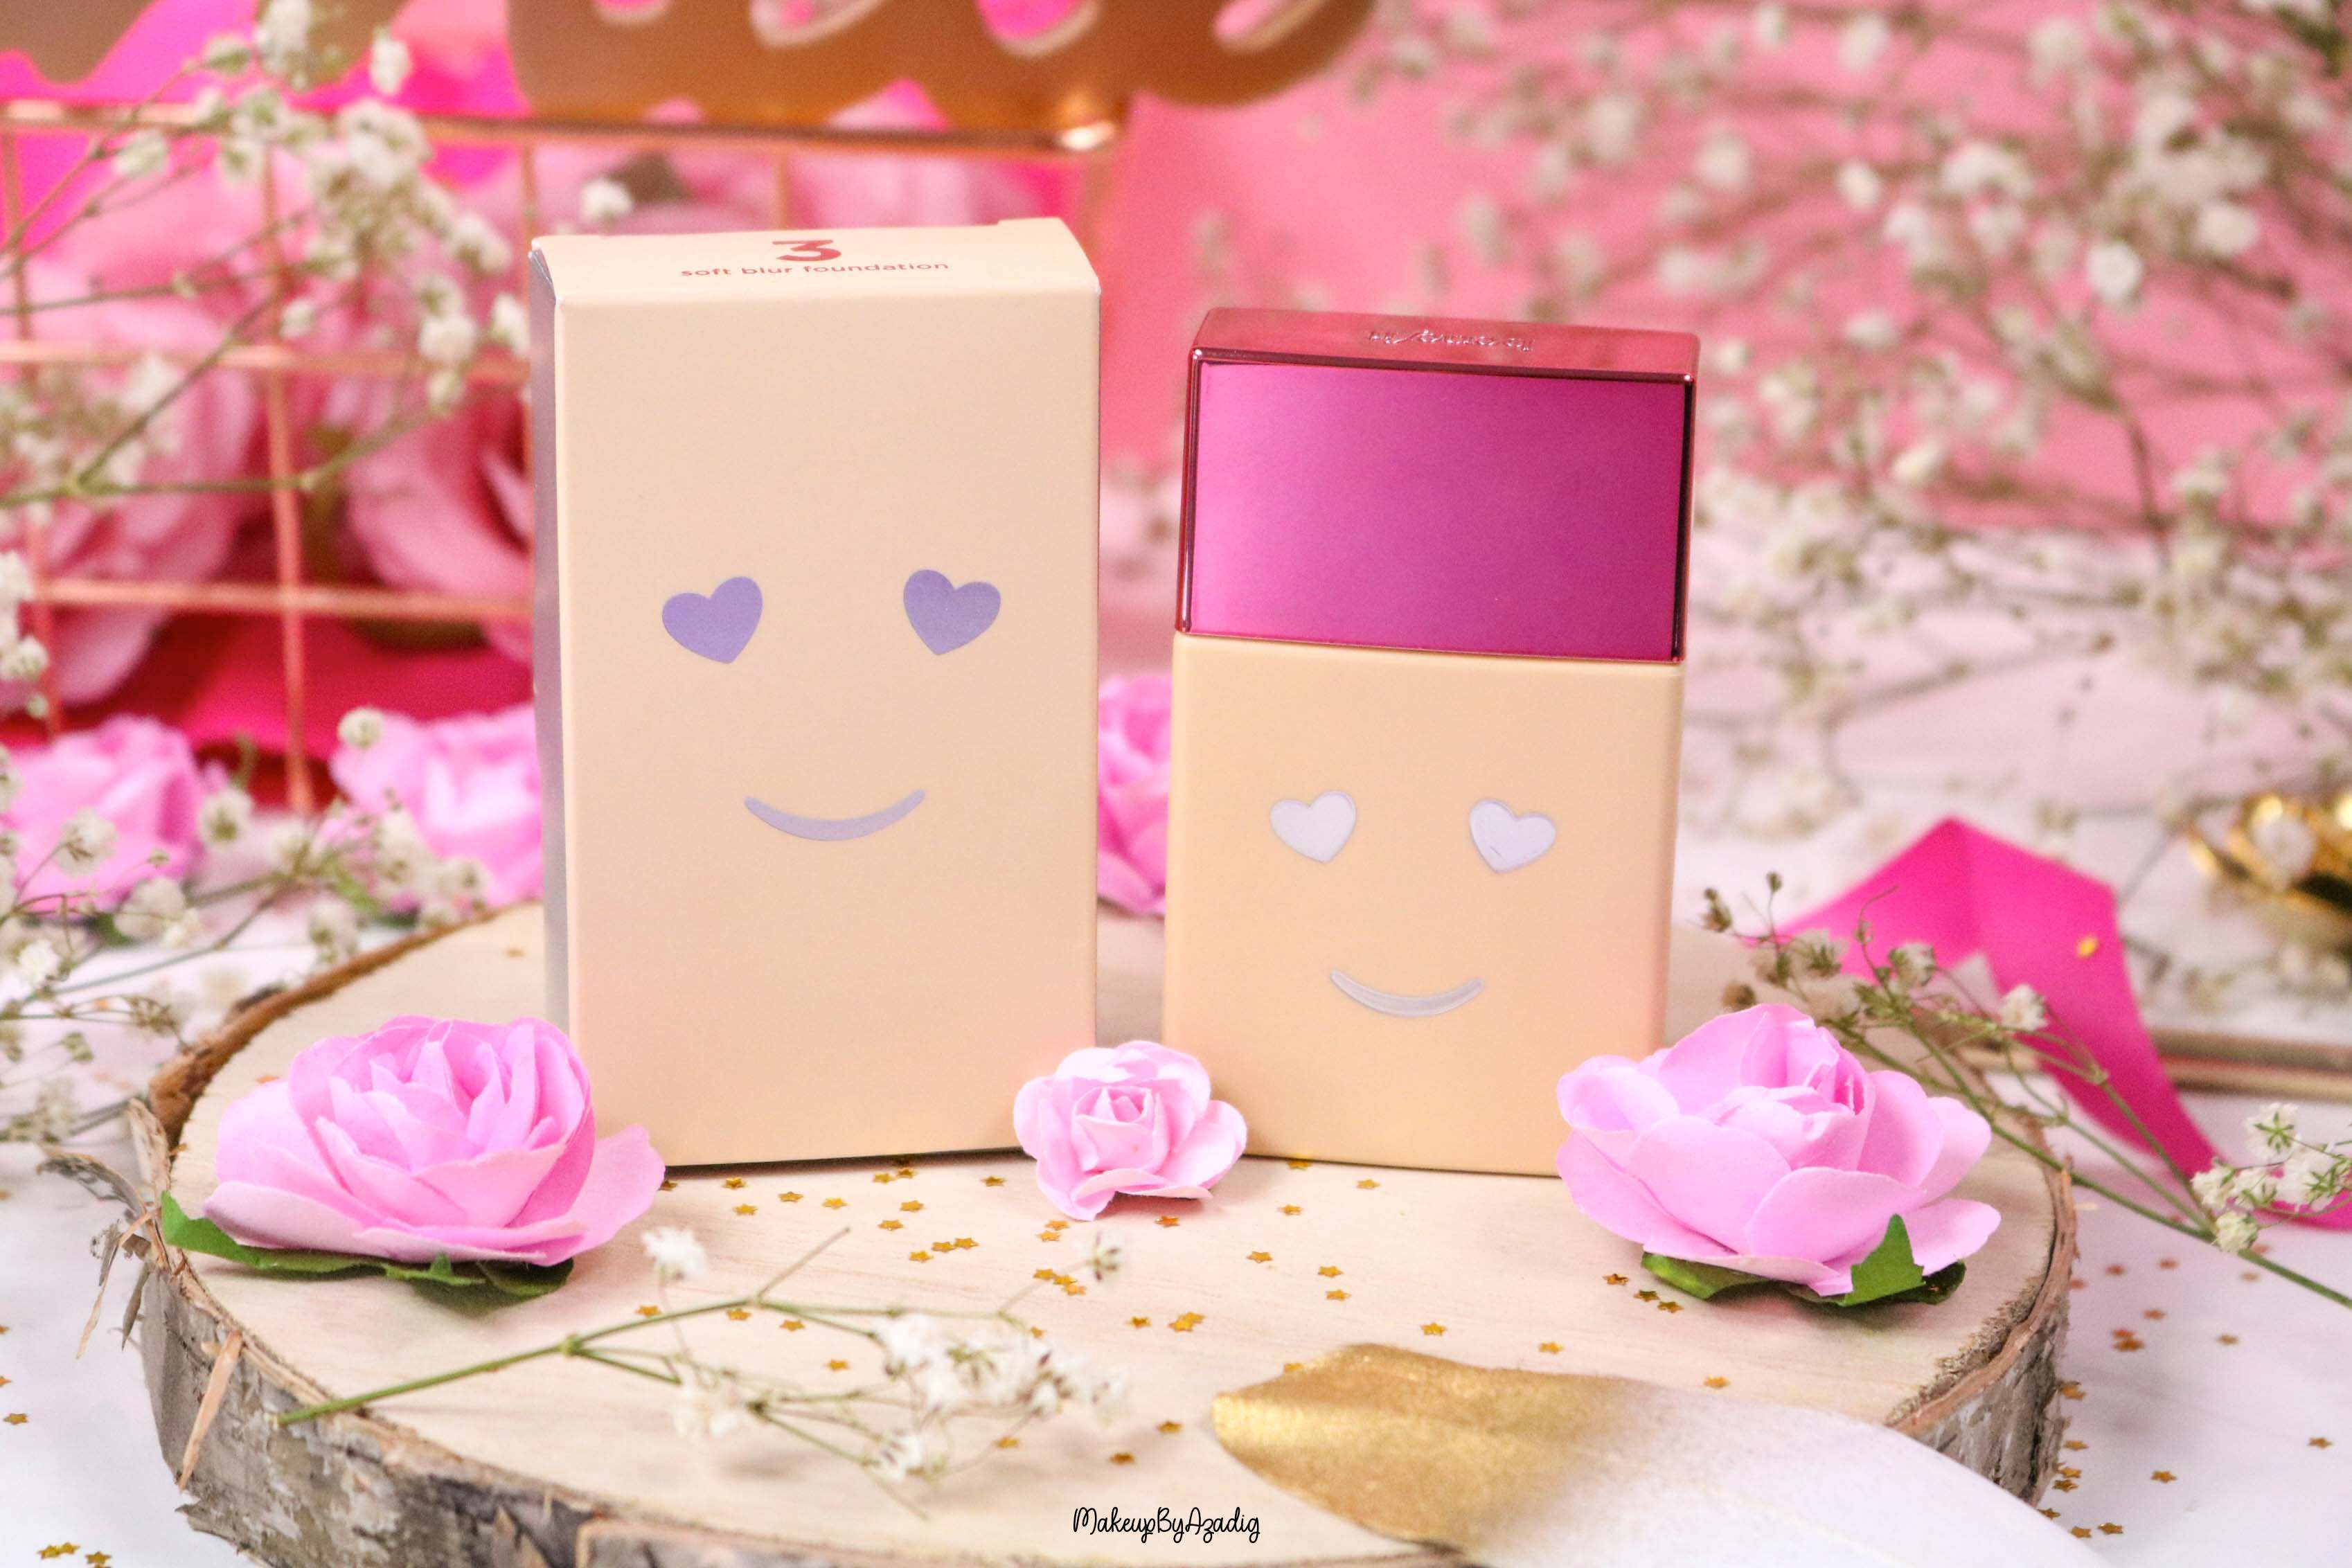 revue-nouveau-fond-de-teint-hello-happy-benefit-sephora-prix-avis-teintes-makeupbyazadig-smiley